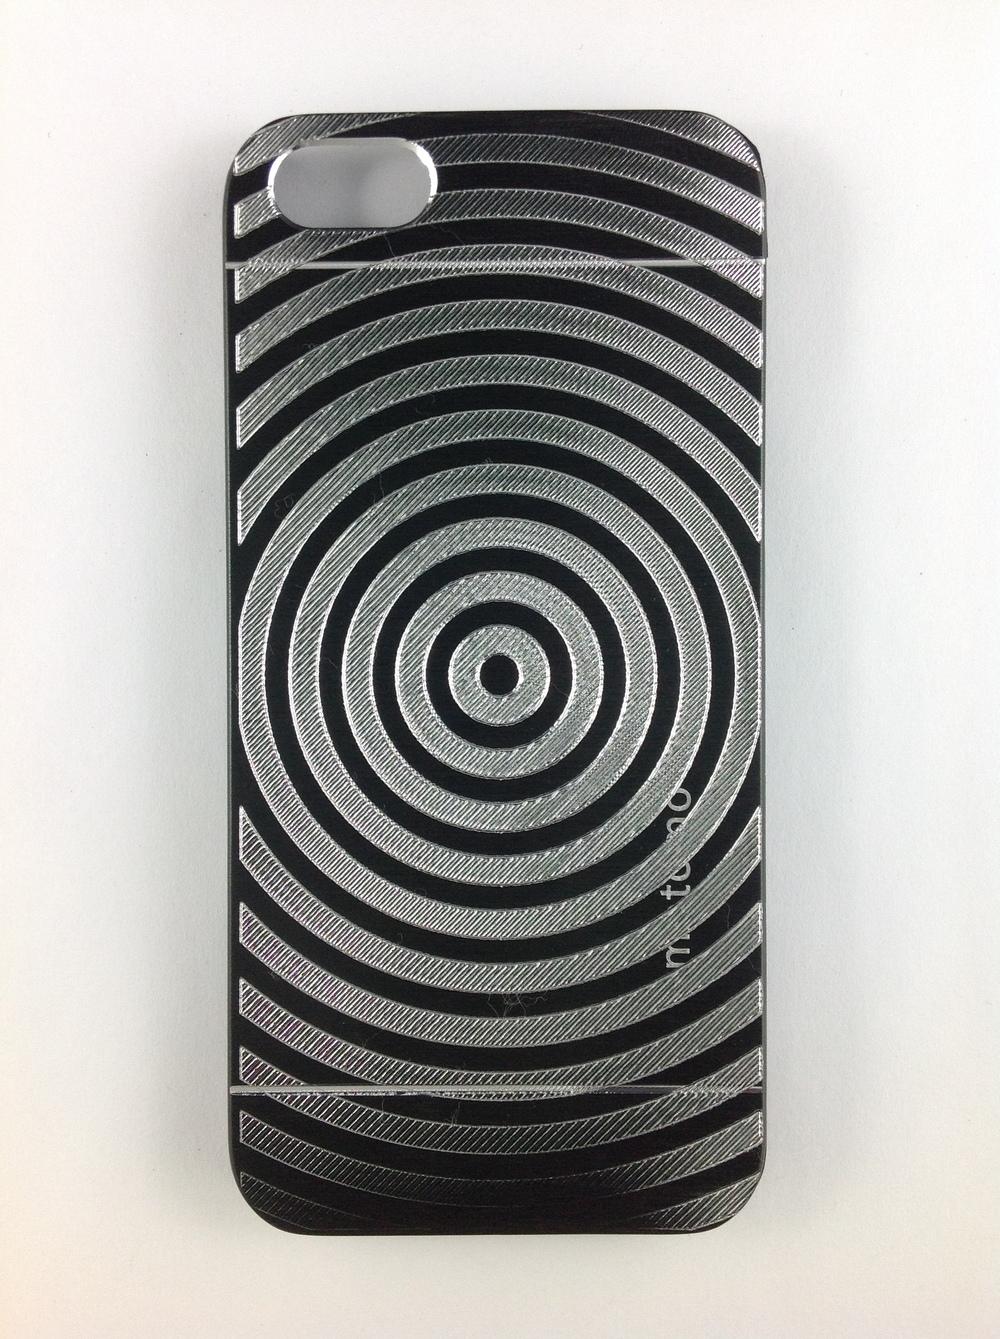 DigitalCarver-iPhone5s-IMG_3702.JPG